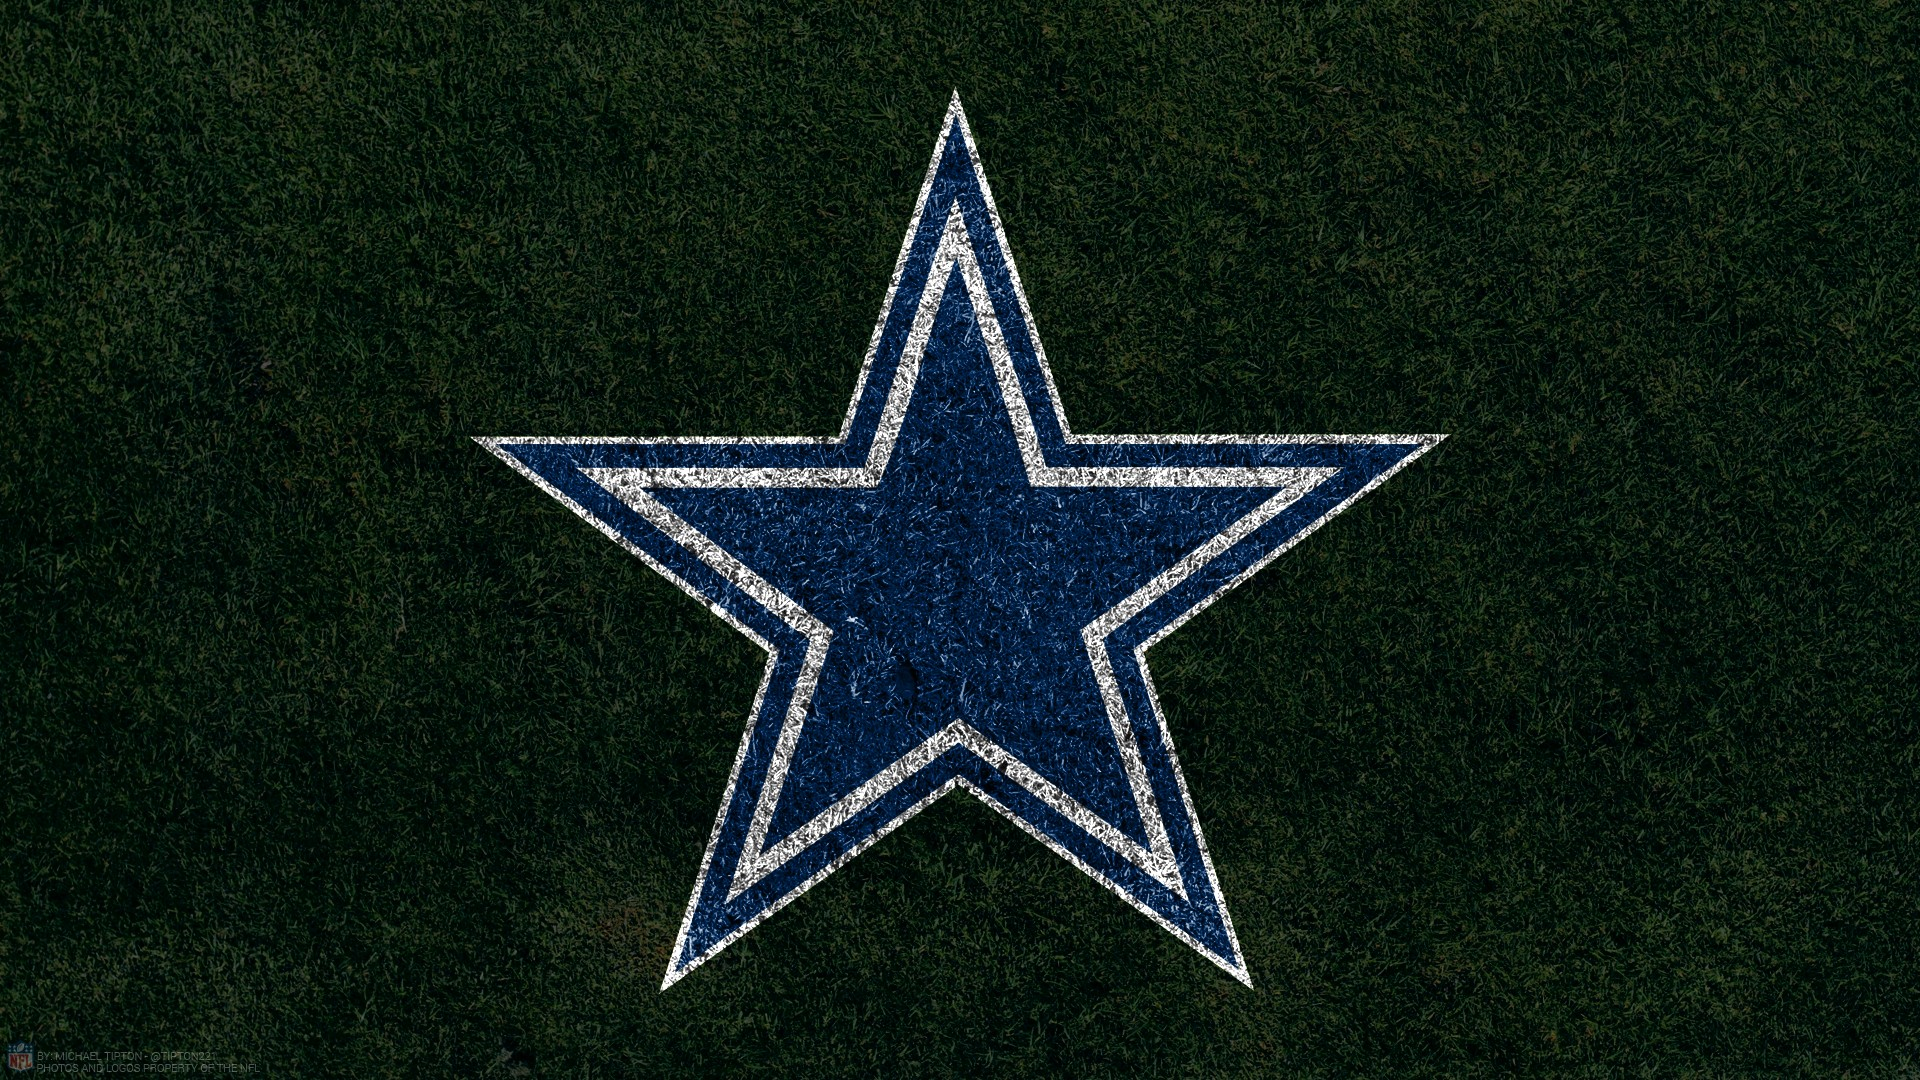 10a447e9d Amazing Dallas Cowboys Dark By Jakeroot On Deviantart - Listitdallas